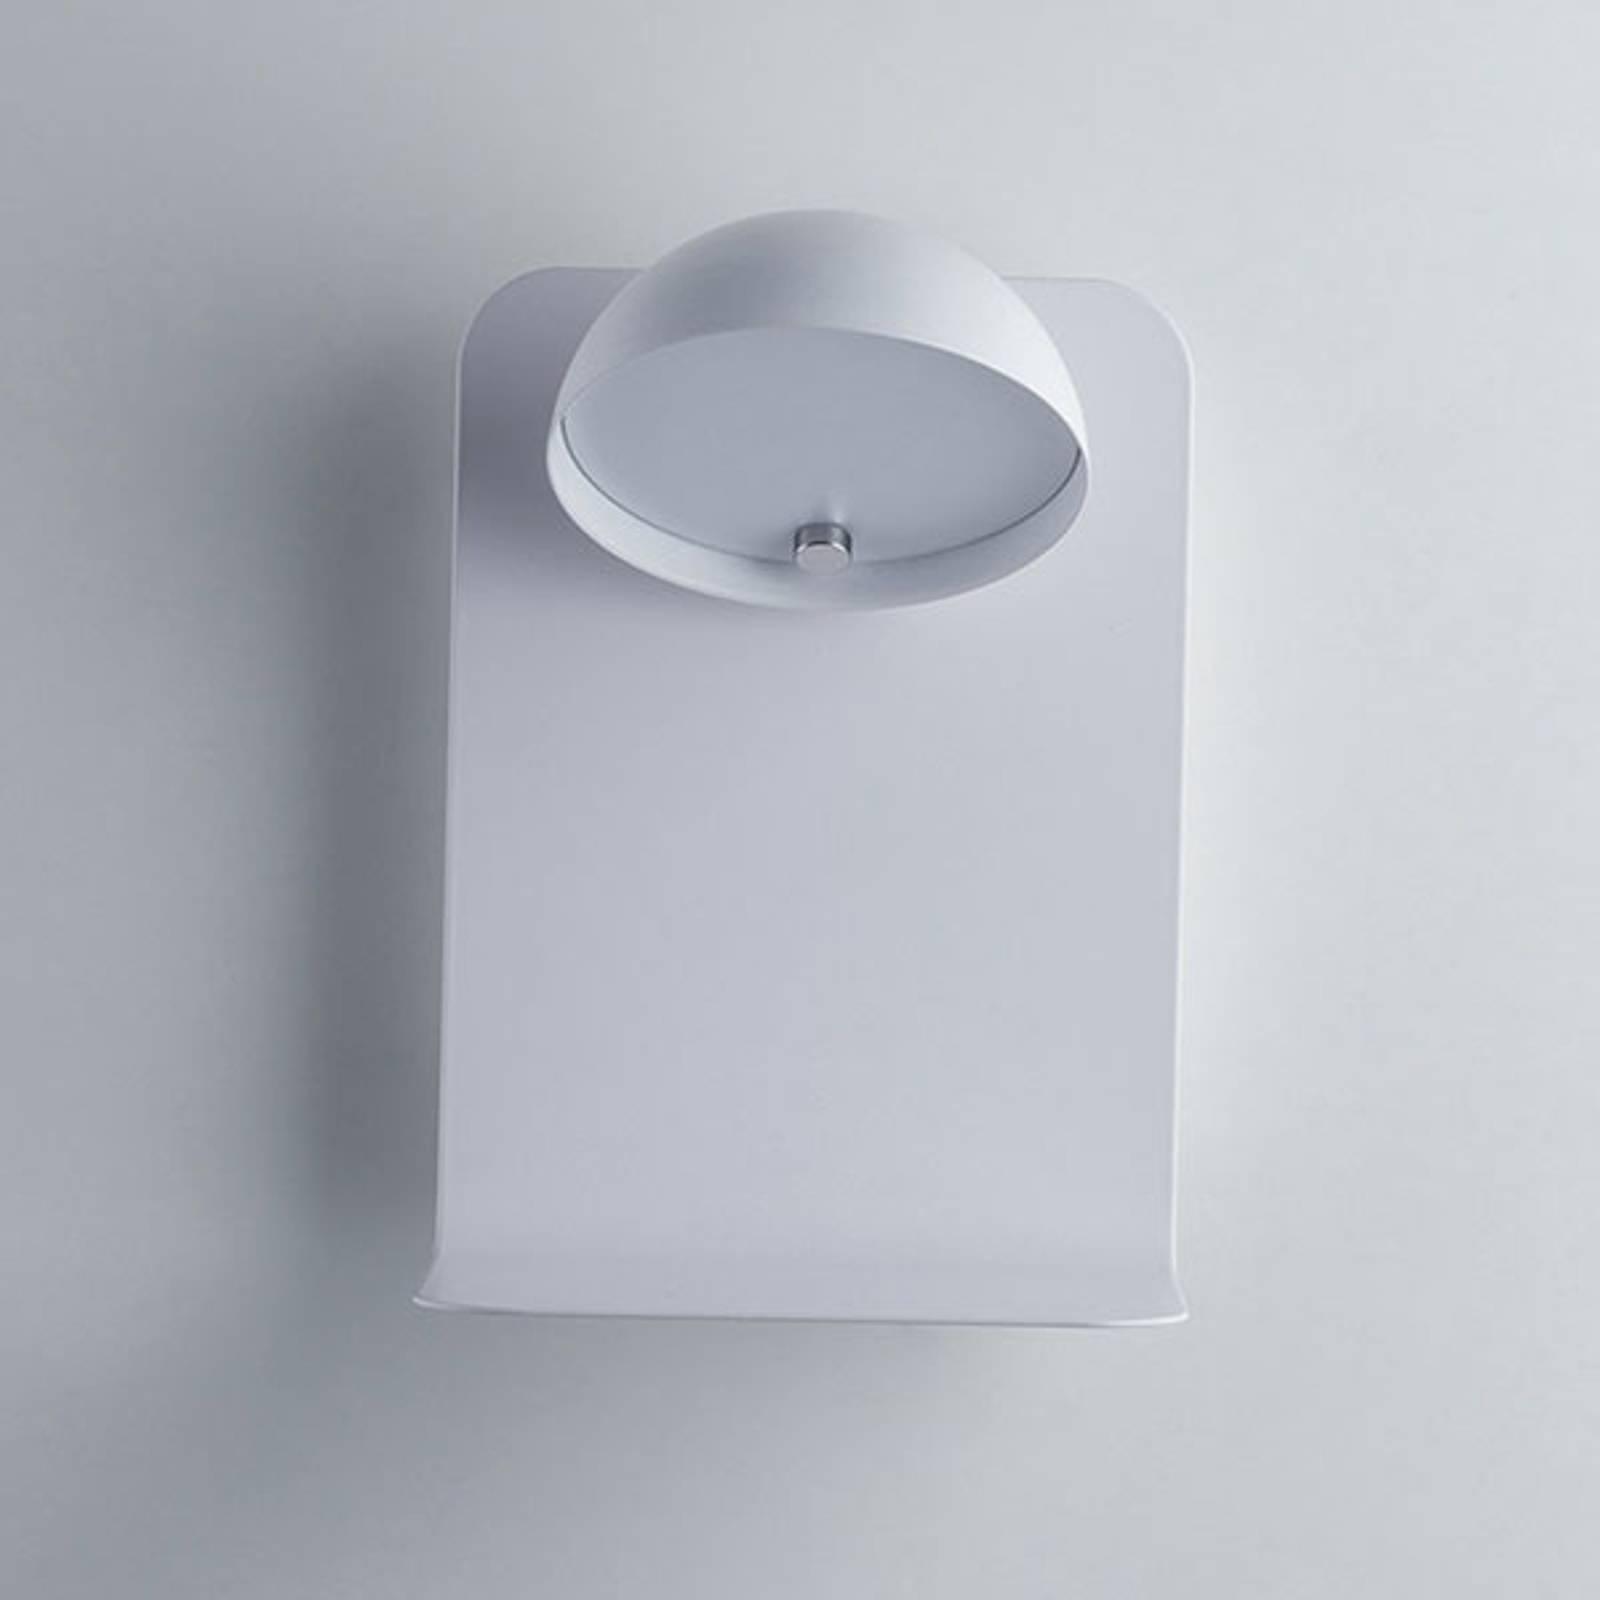 LED-Wandleuchte Boing weiß